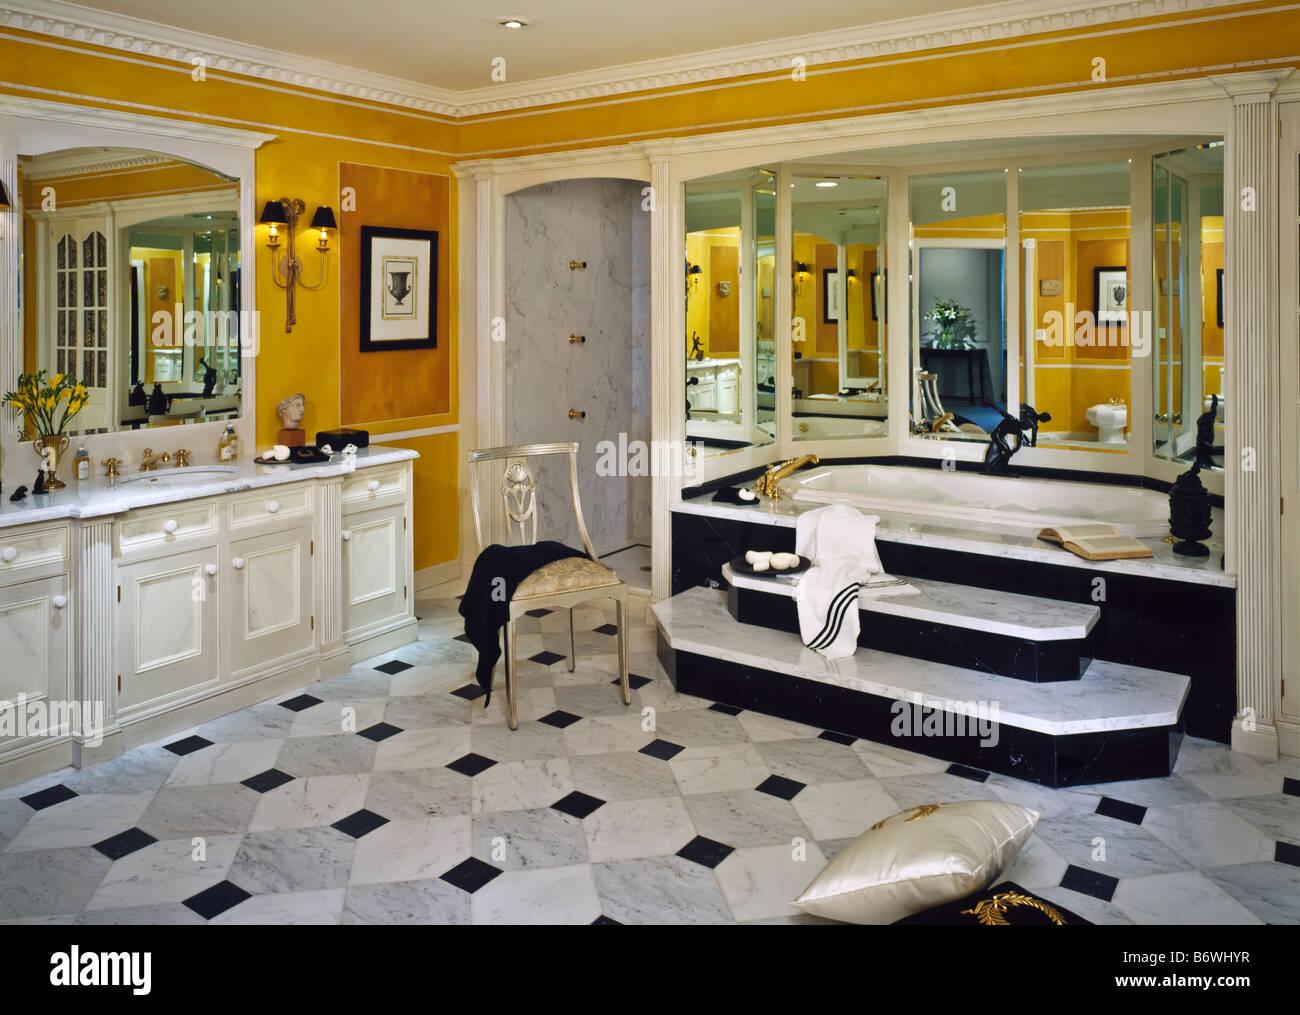 Master suite bathroom vanity lighting light bath room interior lights shower toilet washbasin house home white cabinet tub louve